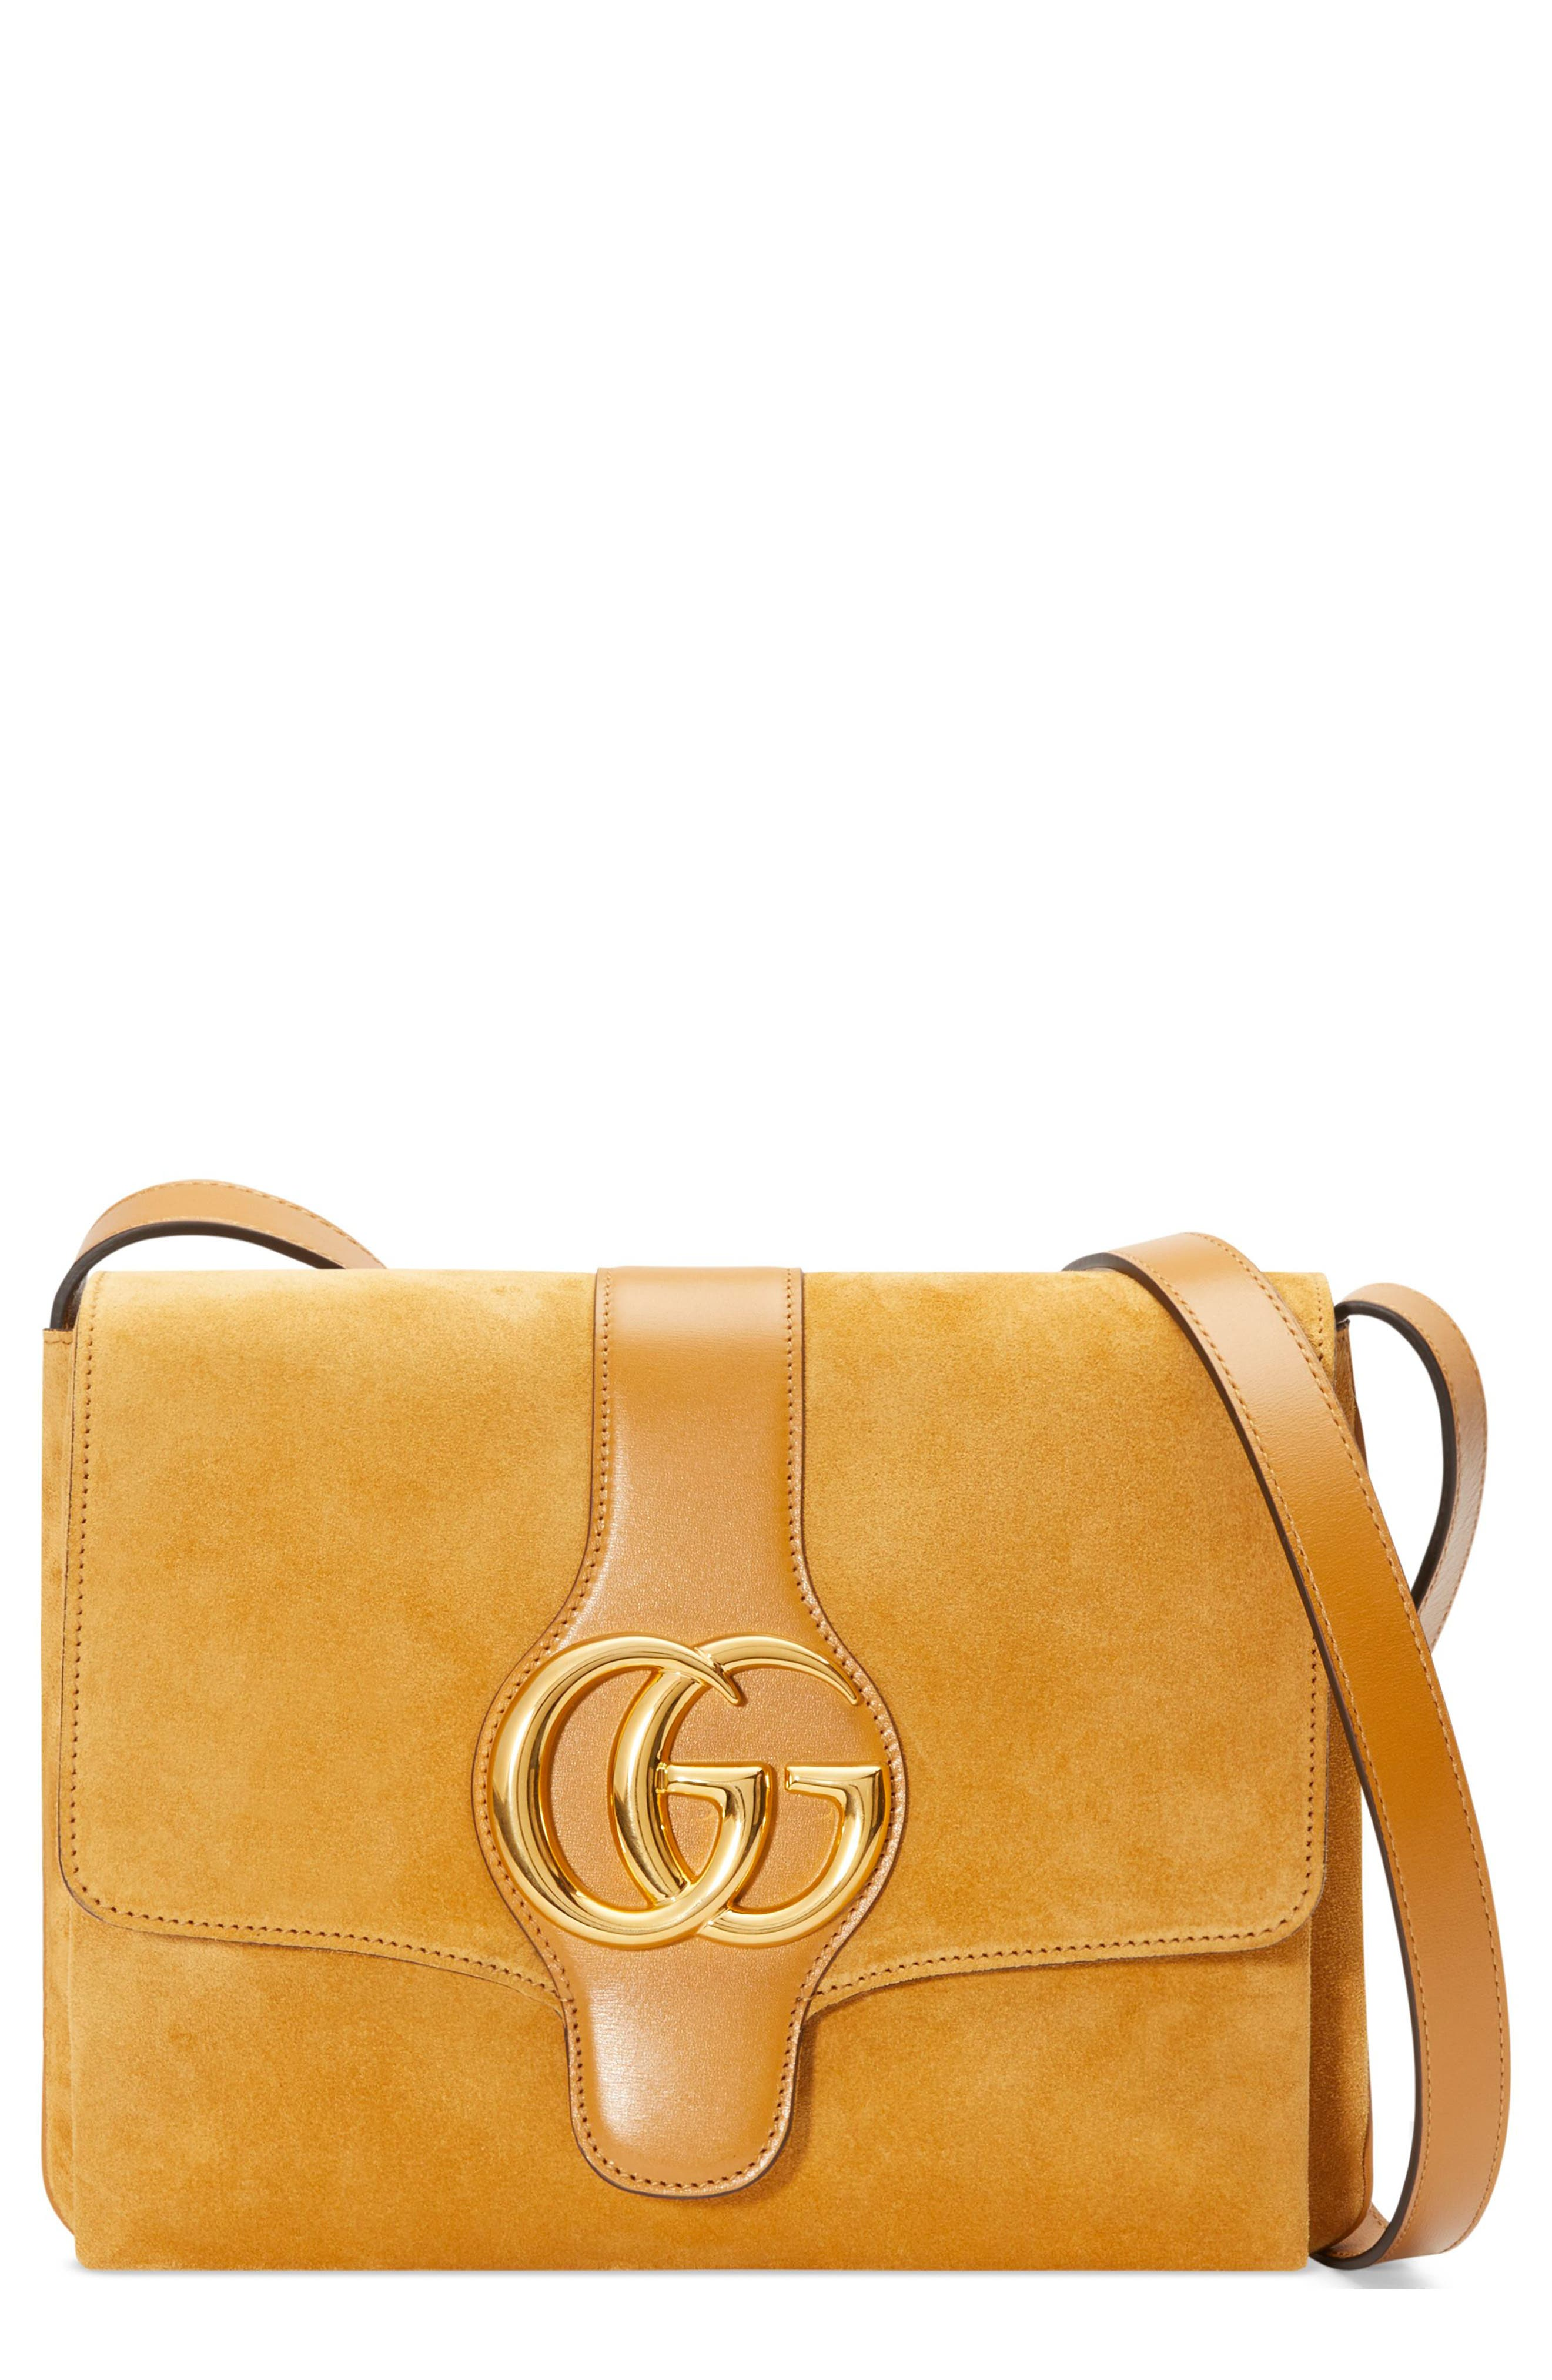 Medium Arli Shoulder Bag,                             Main thumbnail 1, color,                             LIGHT COGNAC